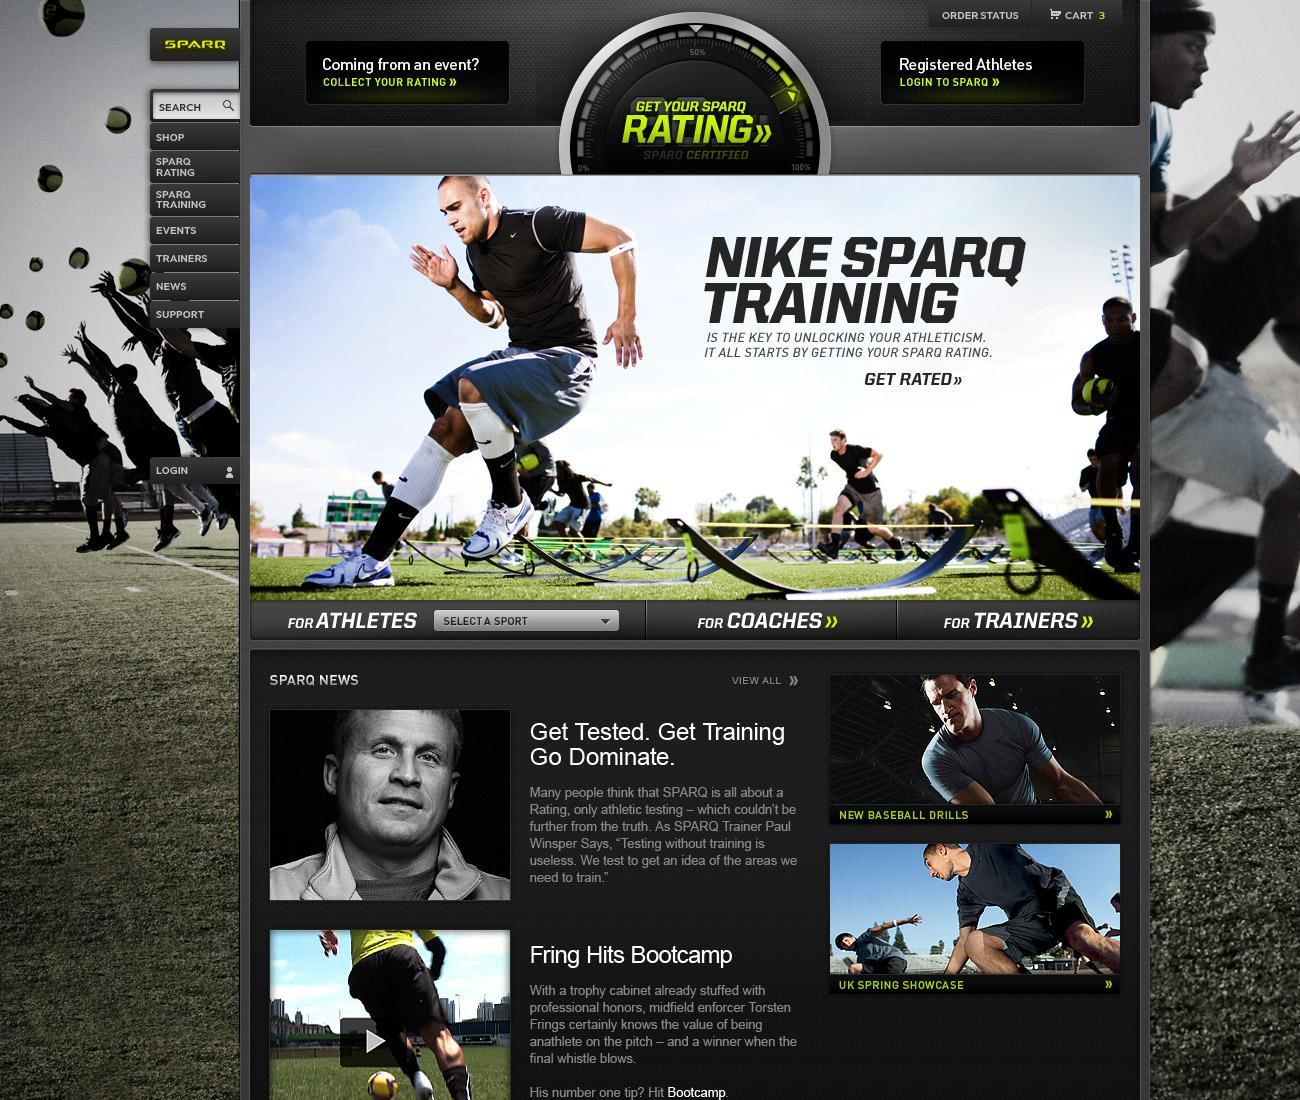 01_SPARQ_Homepage_LoggedOut.jpg (1300×1100)